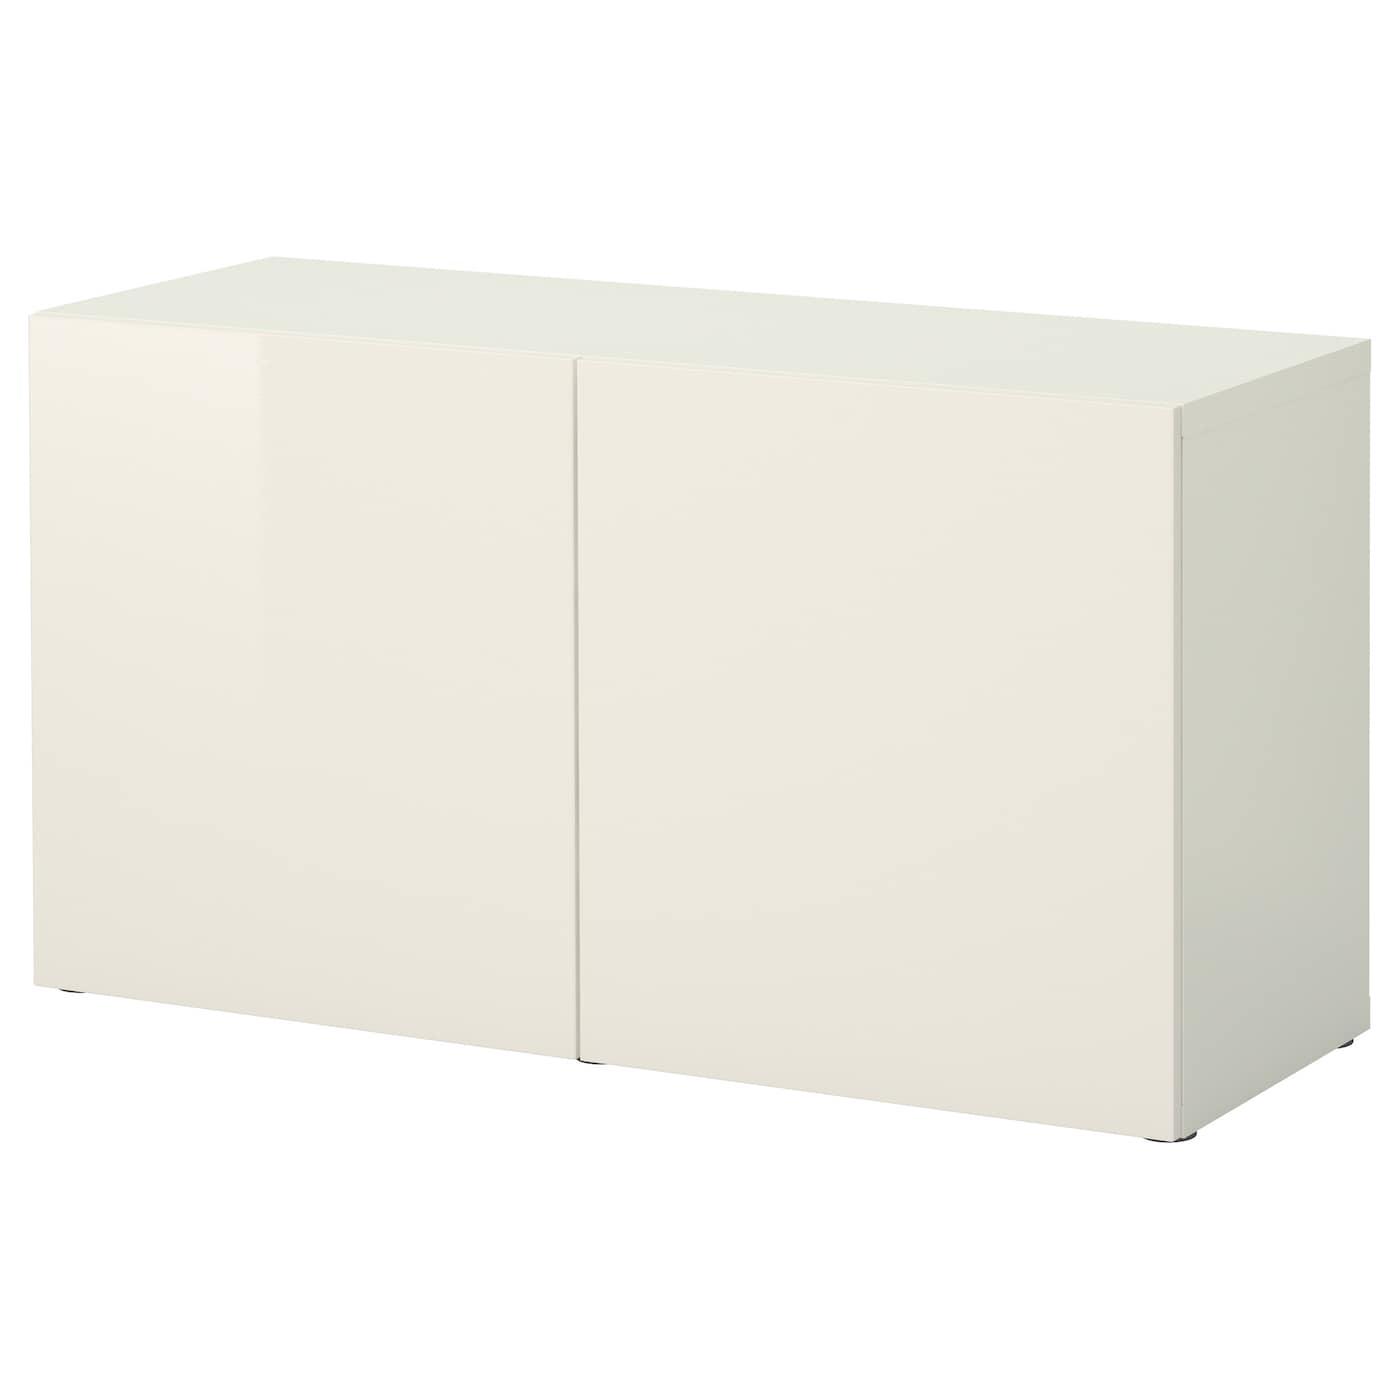 Meuble Ikea Besta Blanc bestÅ Étagère avec portes - blanc, selsviken brillant/blanc 120x40x64 cm